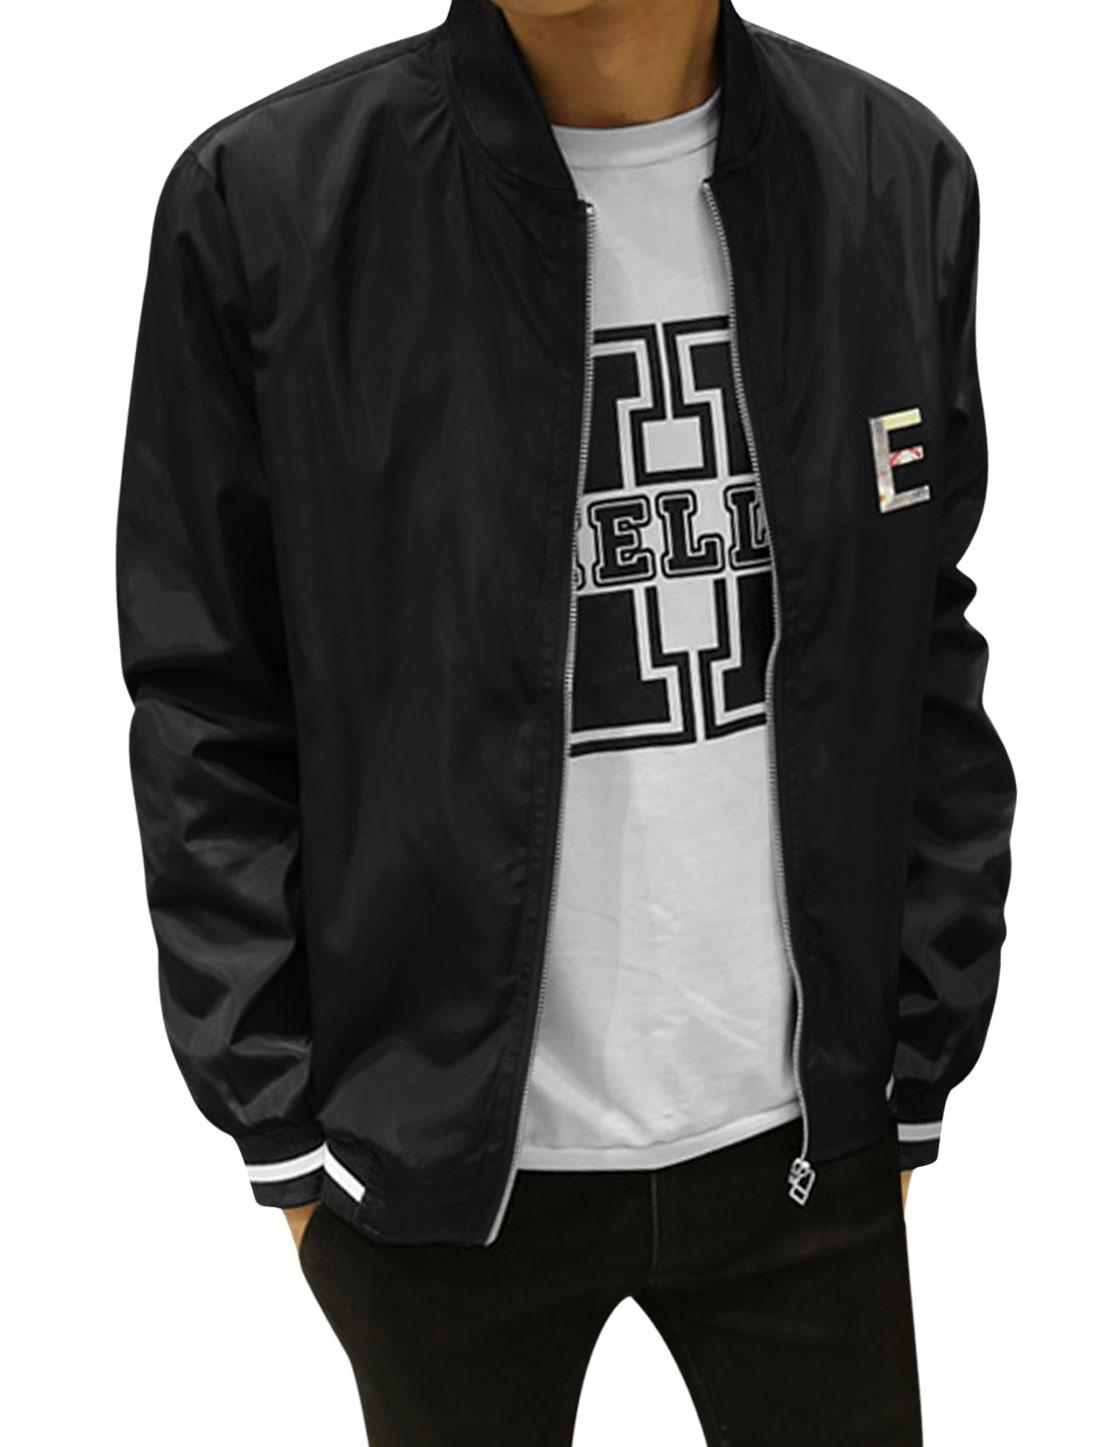 Man Stripes Stand Collar Zip Up Slim Fit Letters Jacket Black S